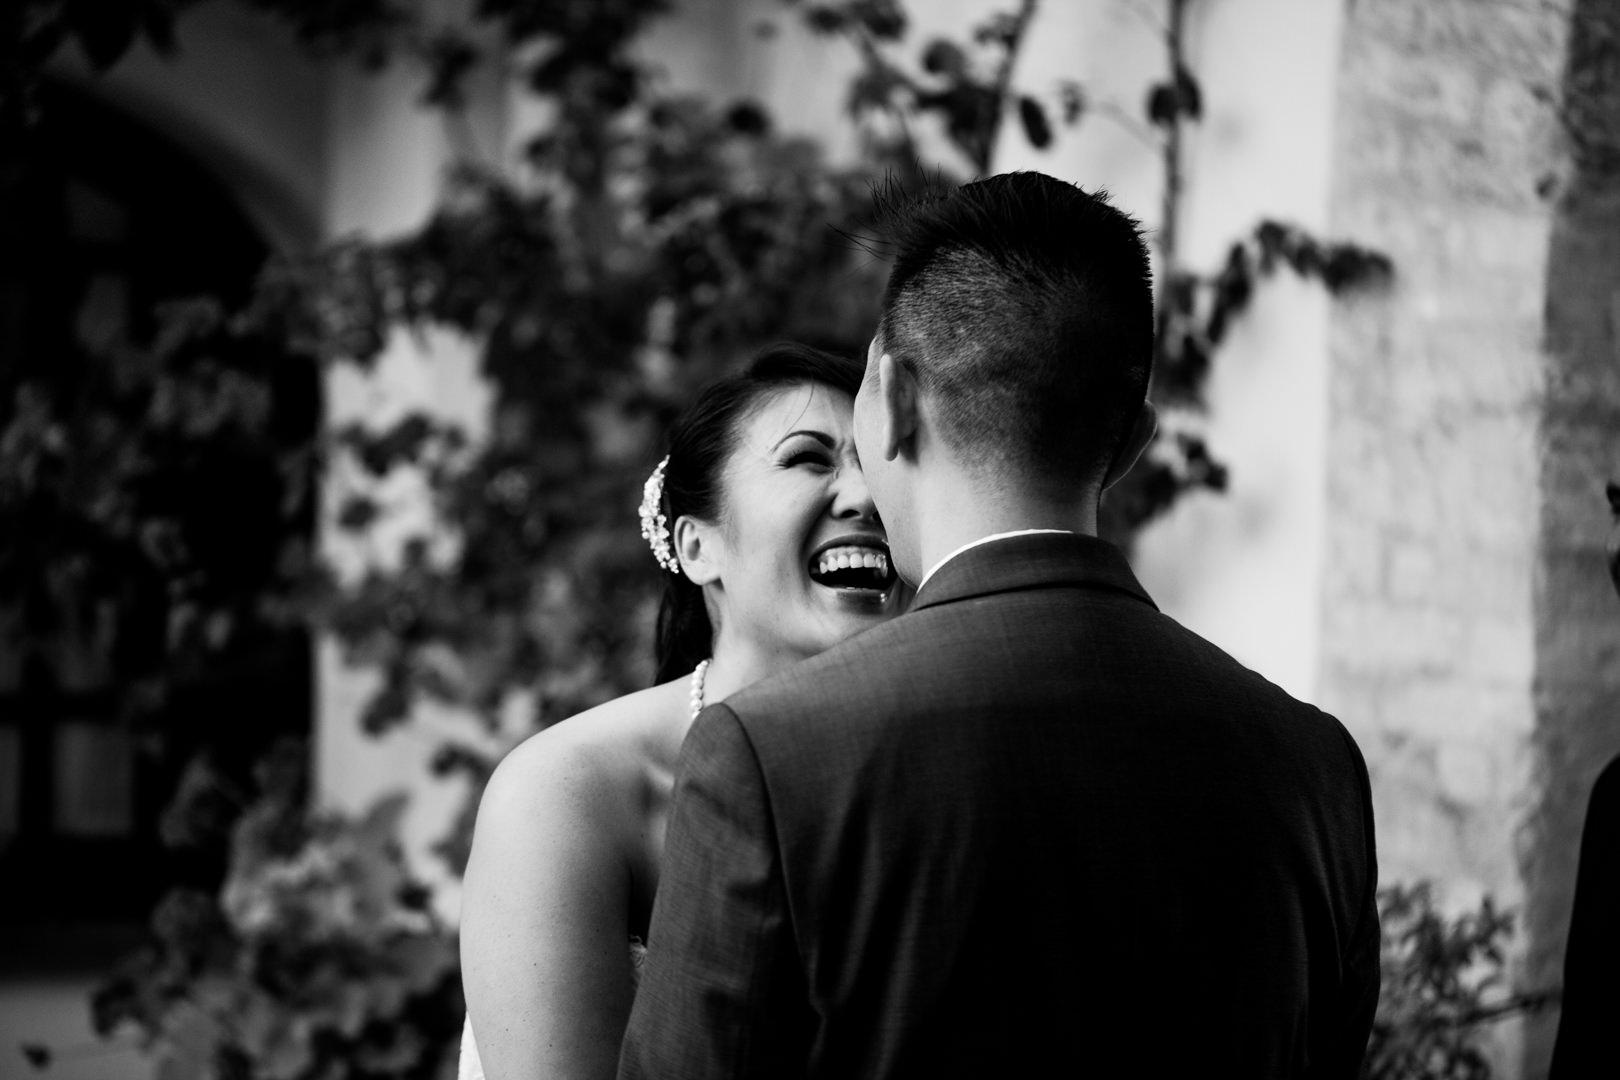 Boda-Hacienda-San-Rafael-Sevilla-engagement-Rafael-Torres-fotografo-bodas-sevilla-madrid-barcelona-wedding-photographer--53.jpg